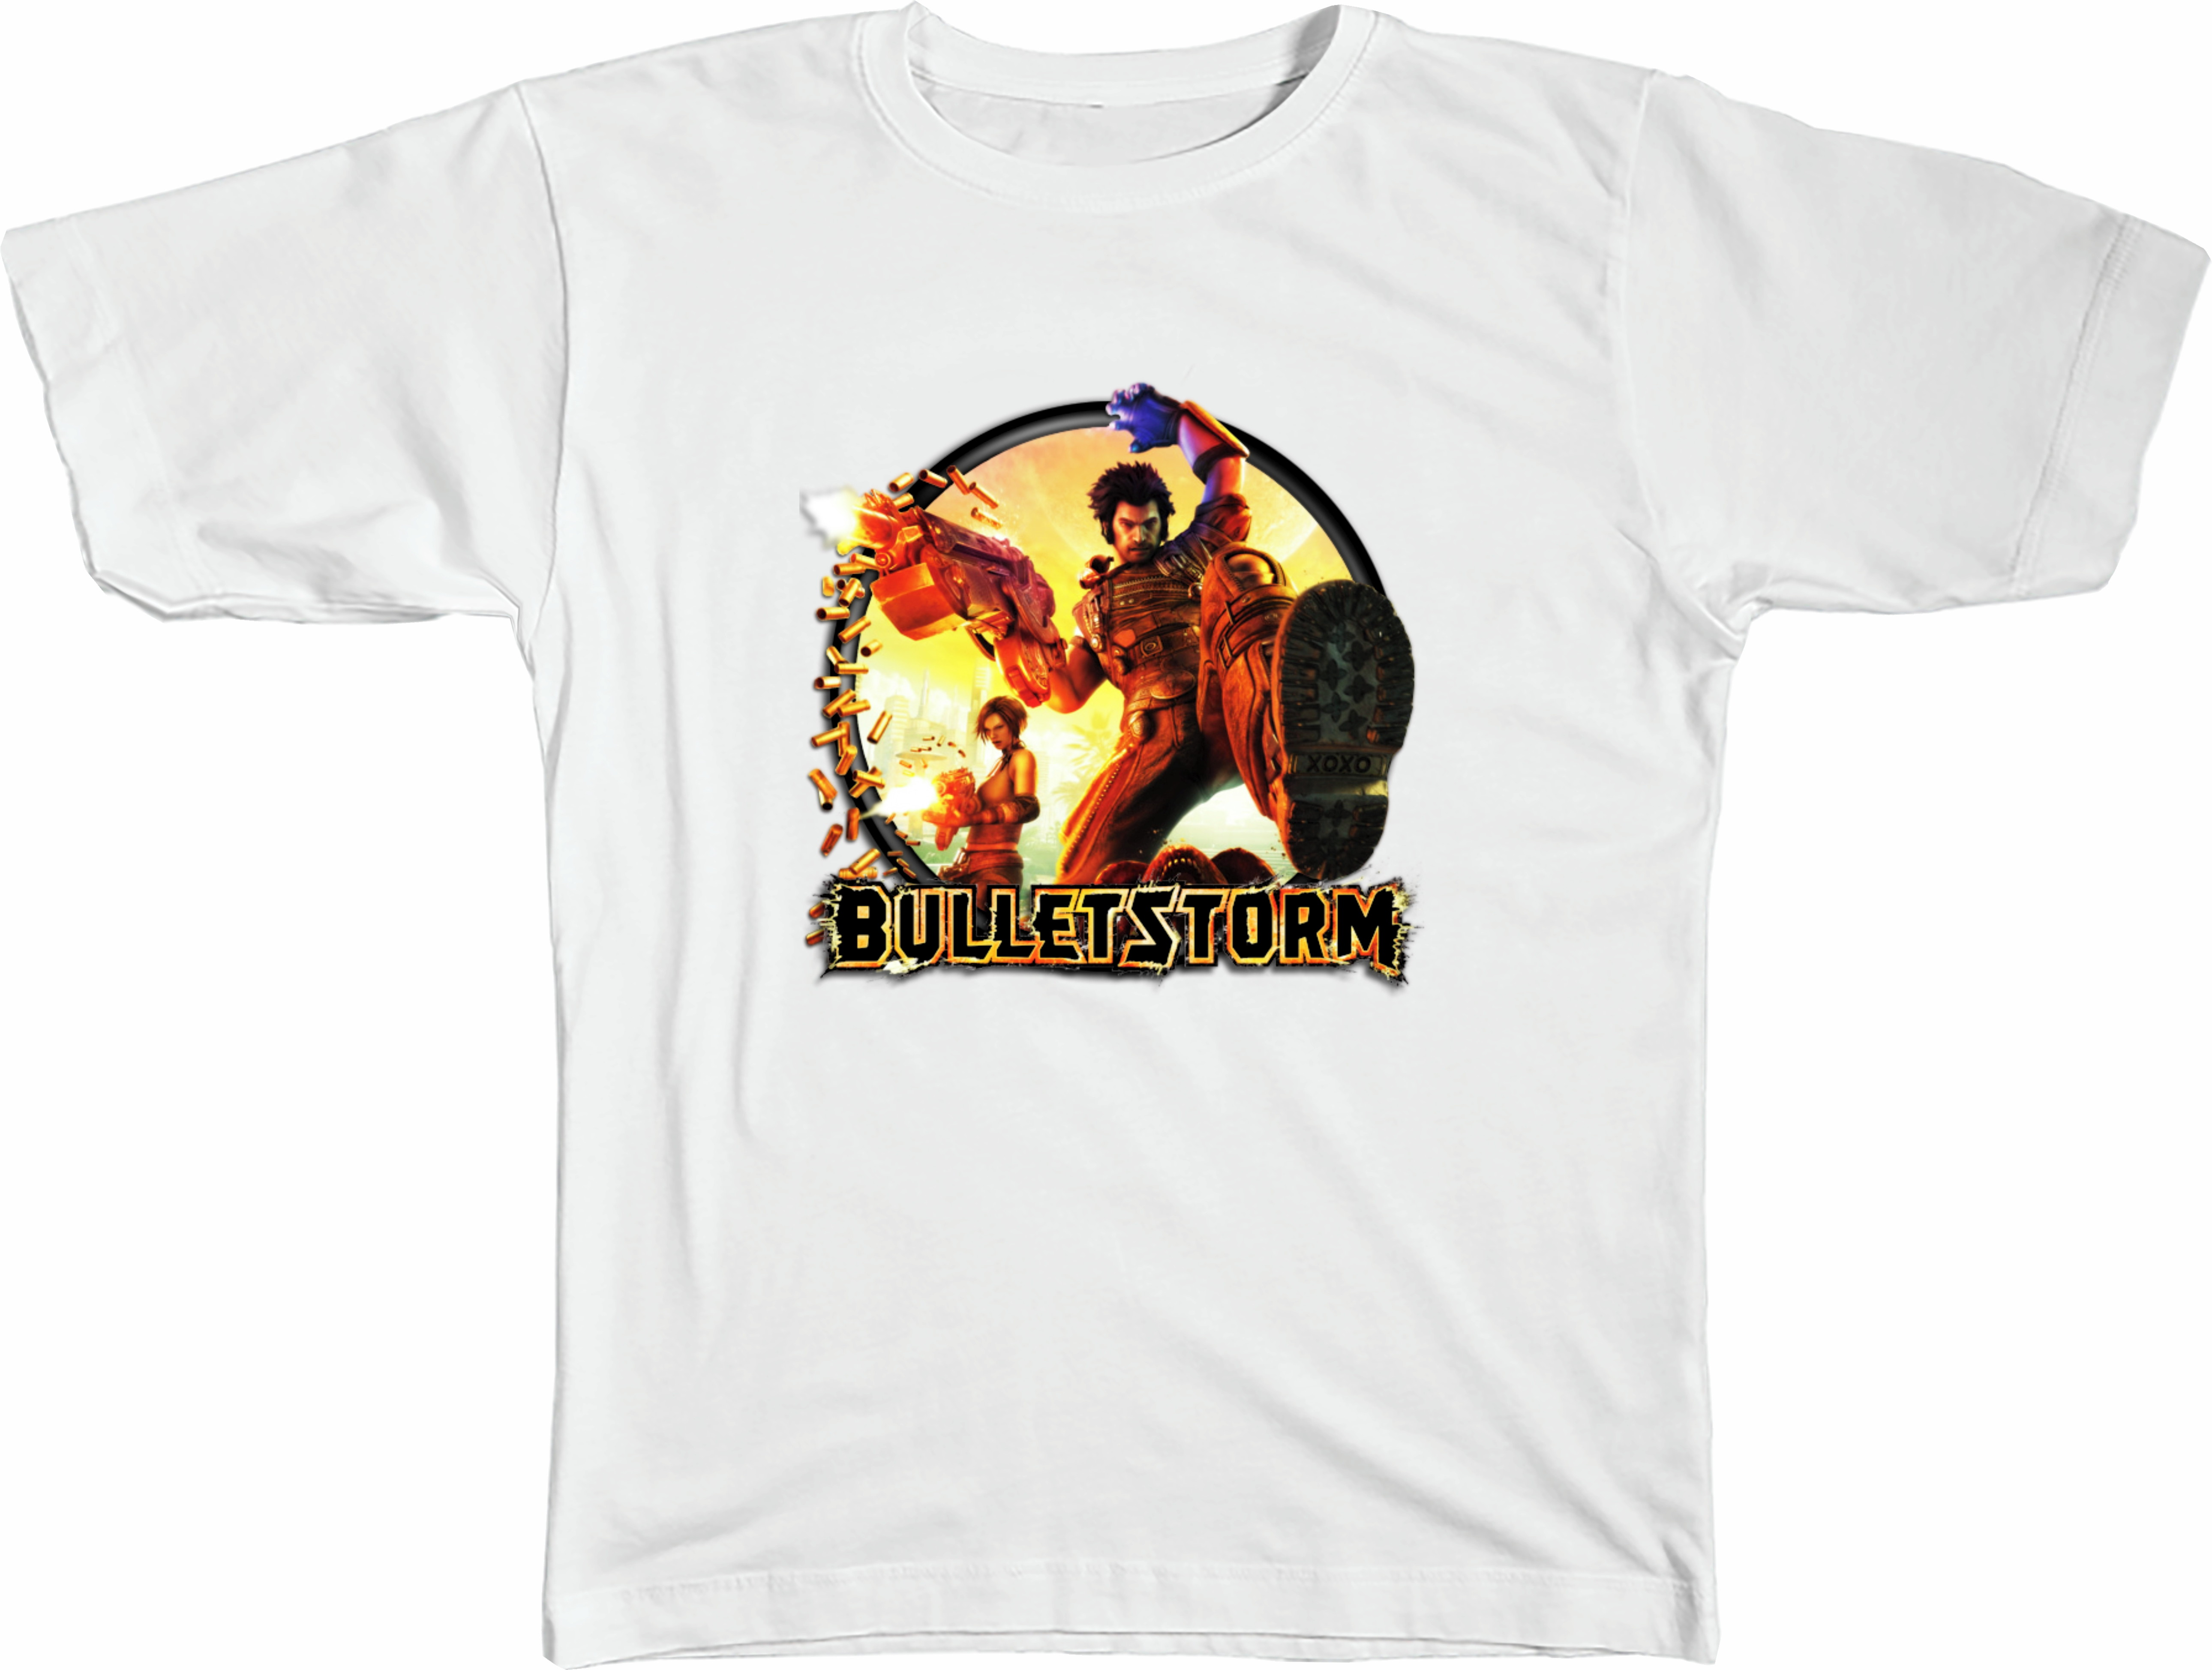 d79d83806 Camisa Camiseta Blusa Jogo de Vídeo Game Crysis 01 no Elo7